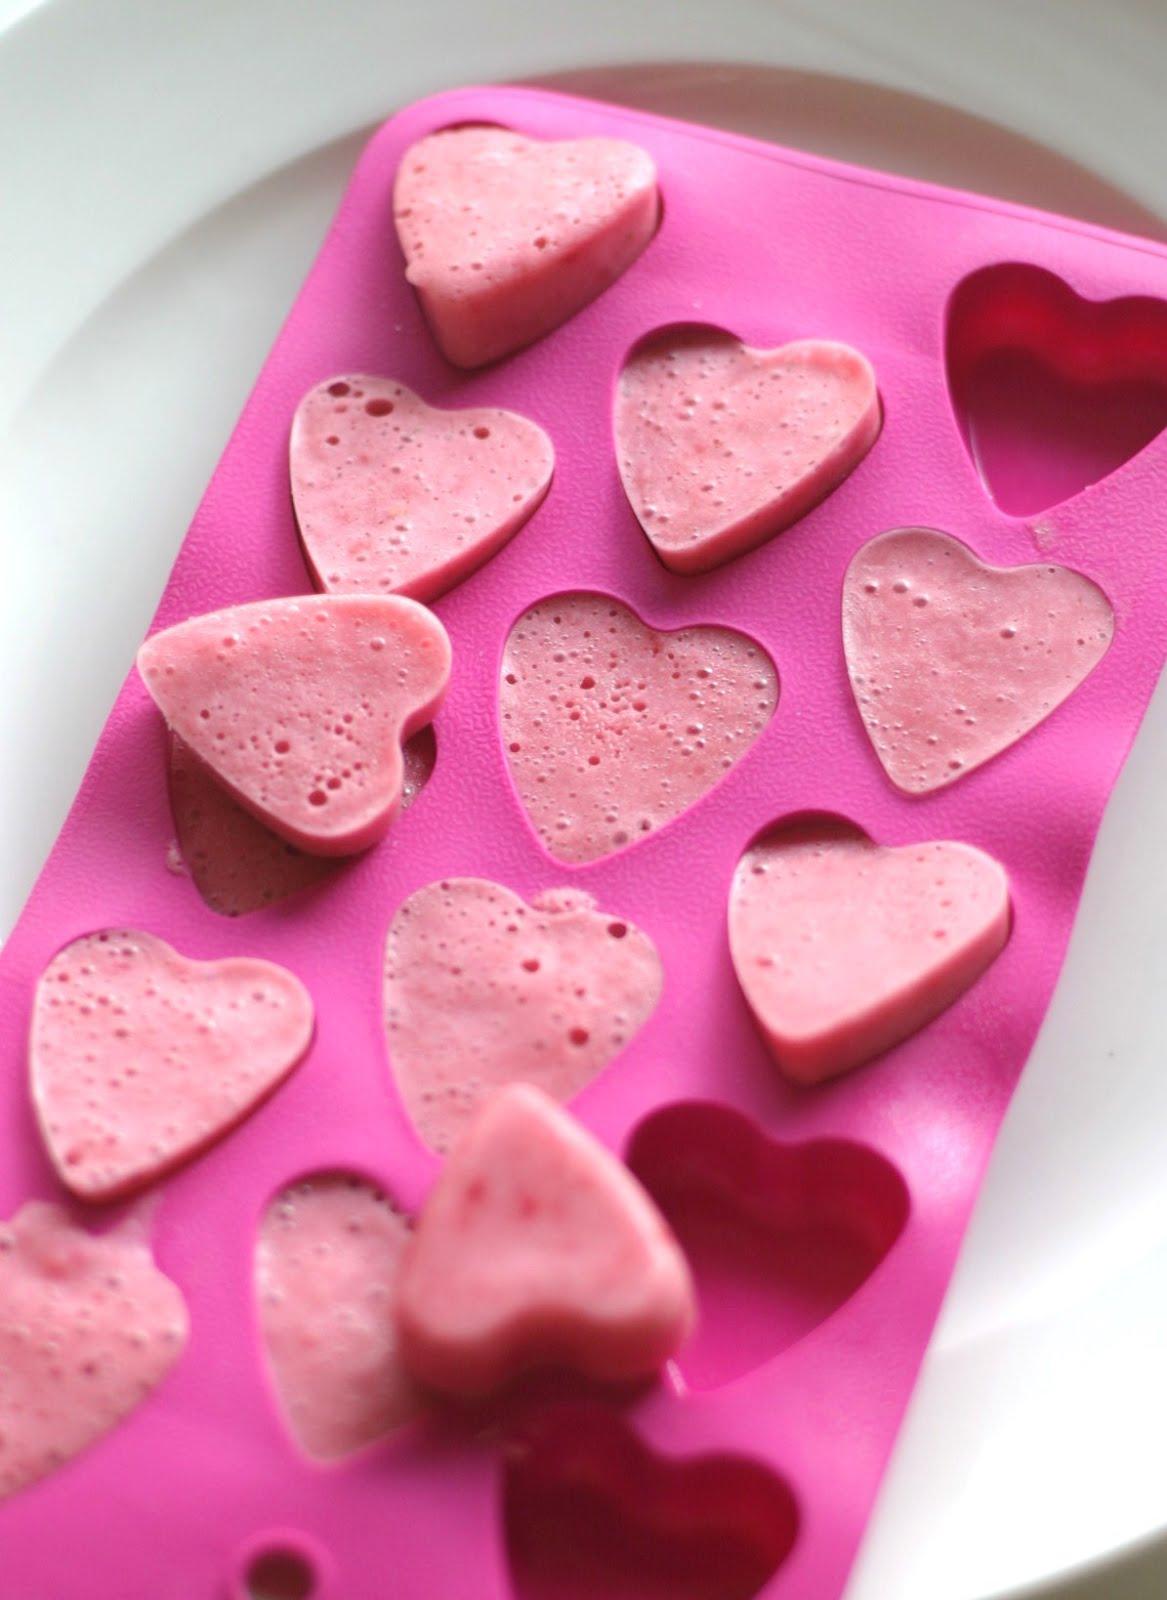 Pink Little Cake Frozen Berry Yogurt Hearts